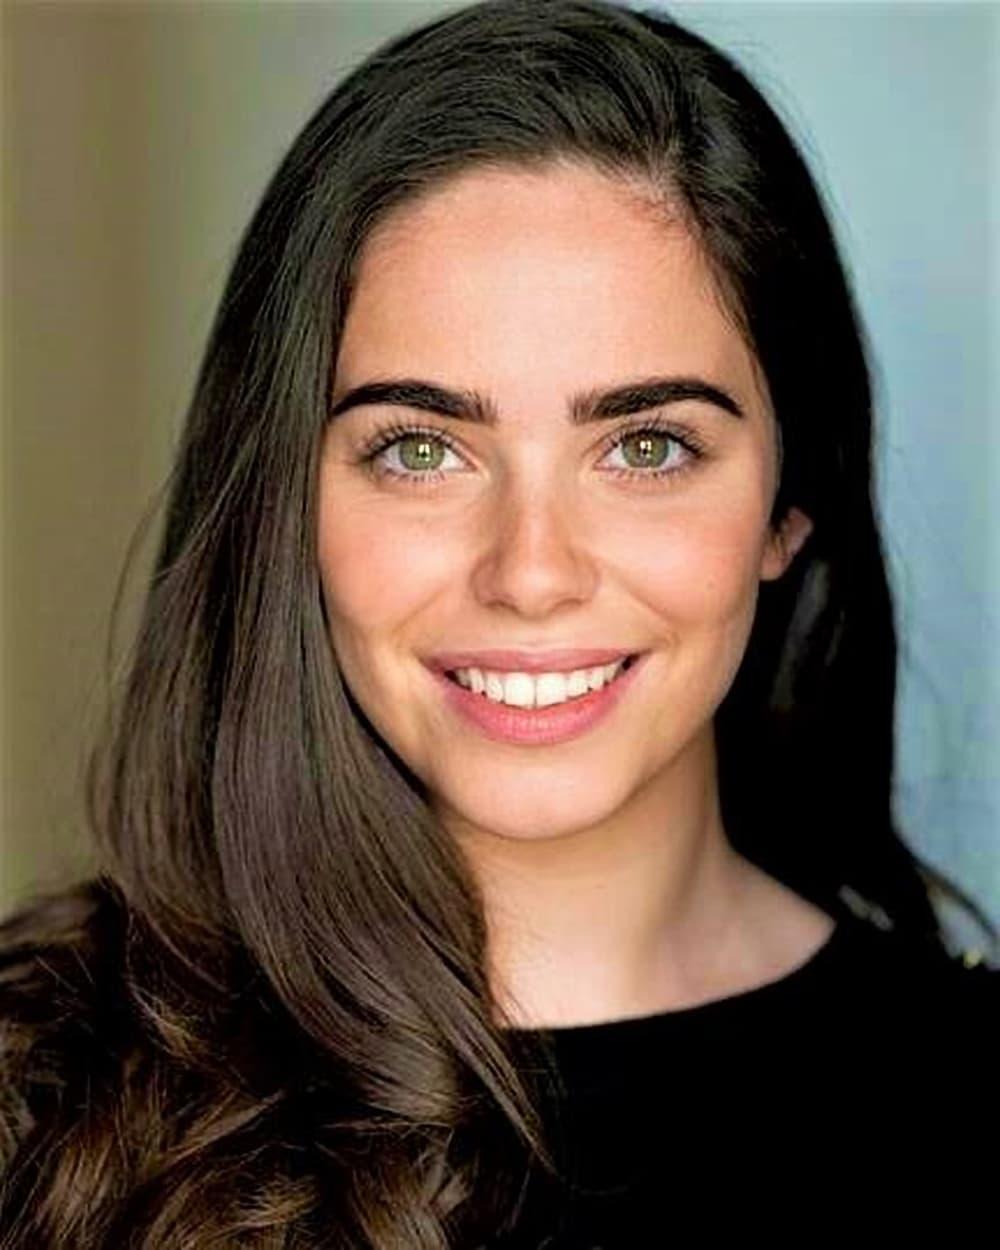 Chloe O'Gorman